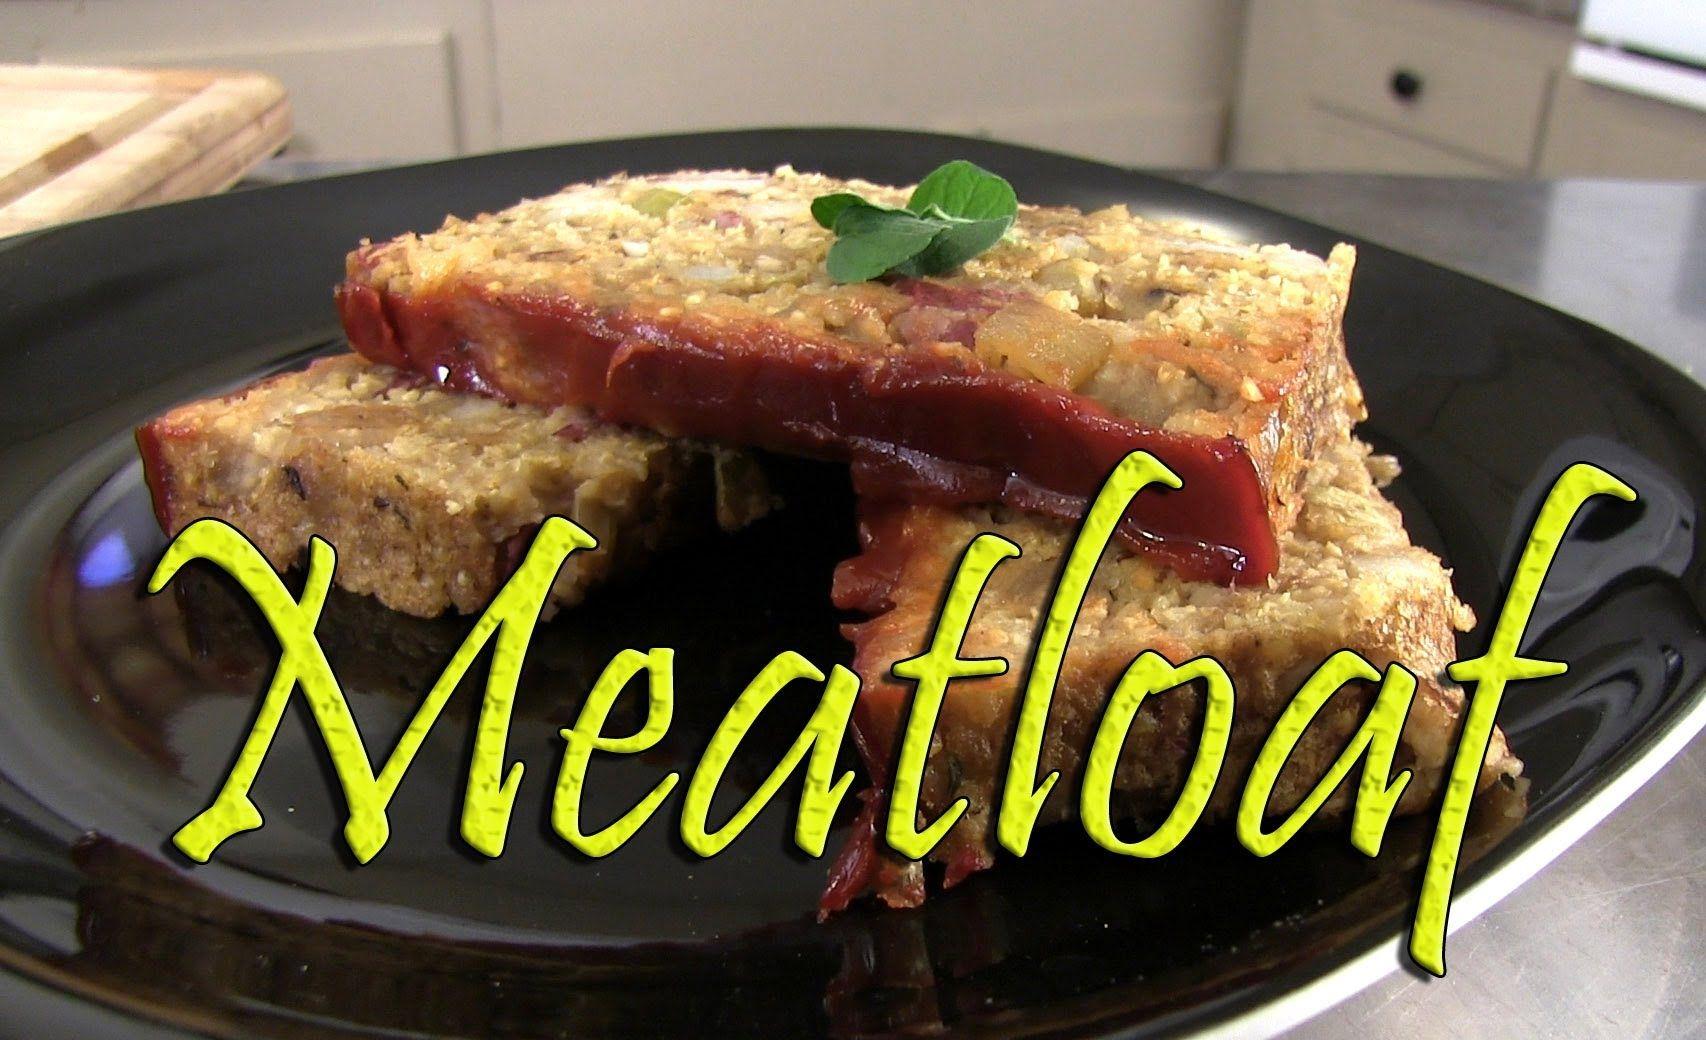 Alton Brown Makes His Good Eats Meatloaf Food Network Youtube Food Network Recipes Meatloaf Recipes Food Network Best Easy Meatloaf Recipe